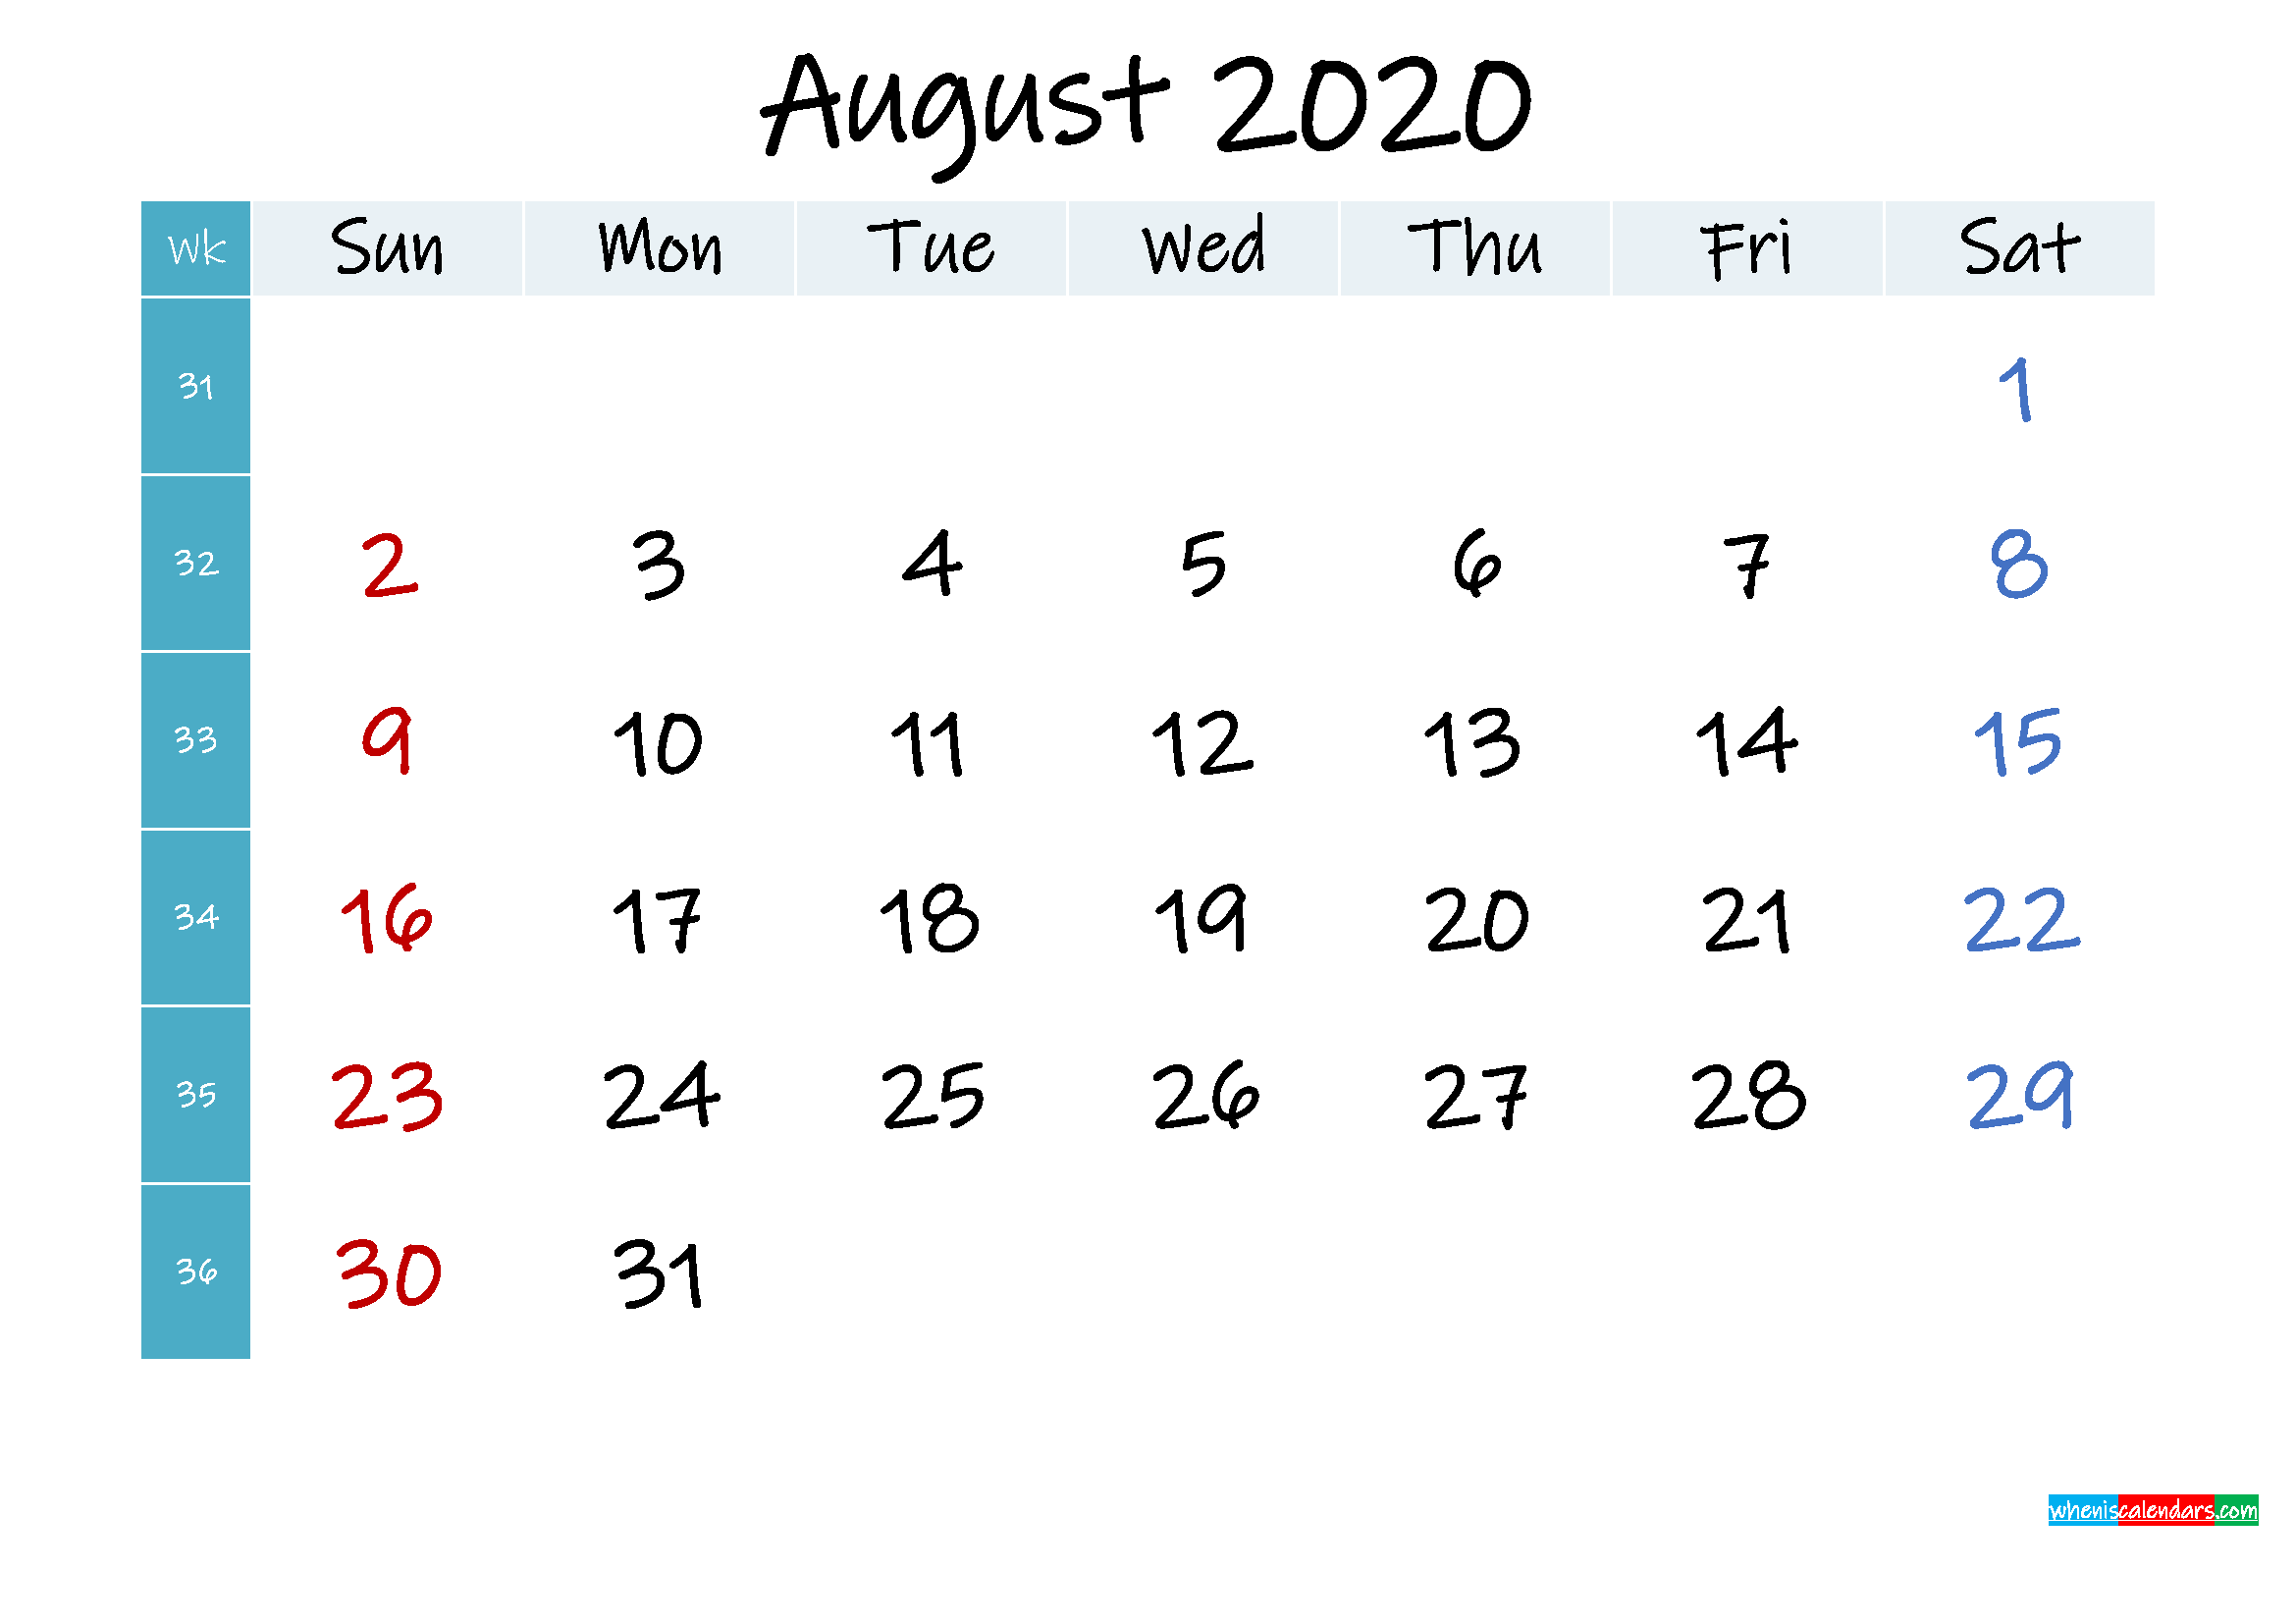 August 2020 Free Printable Calendar